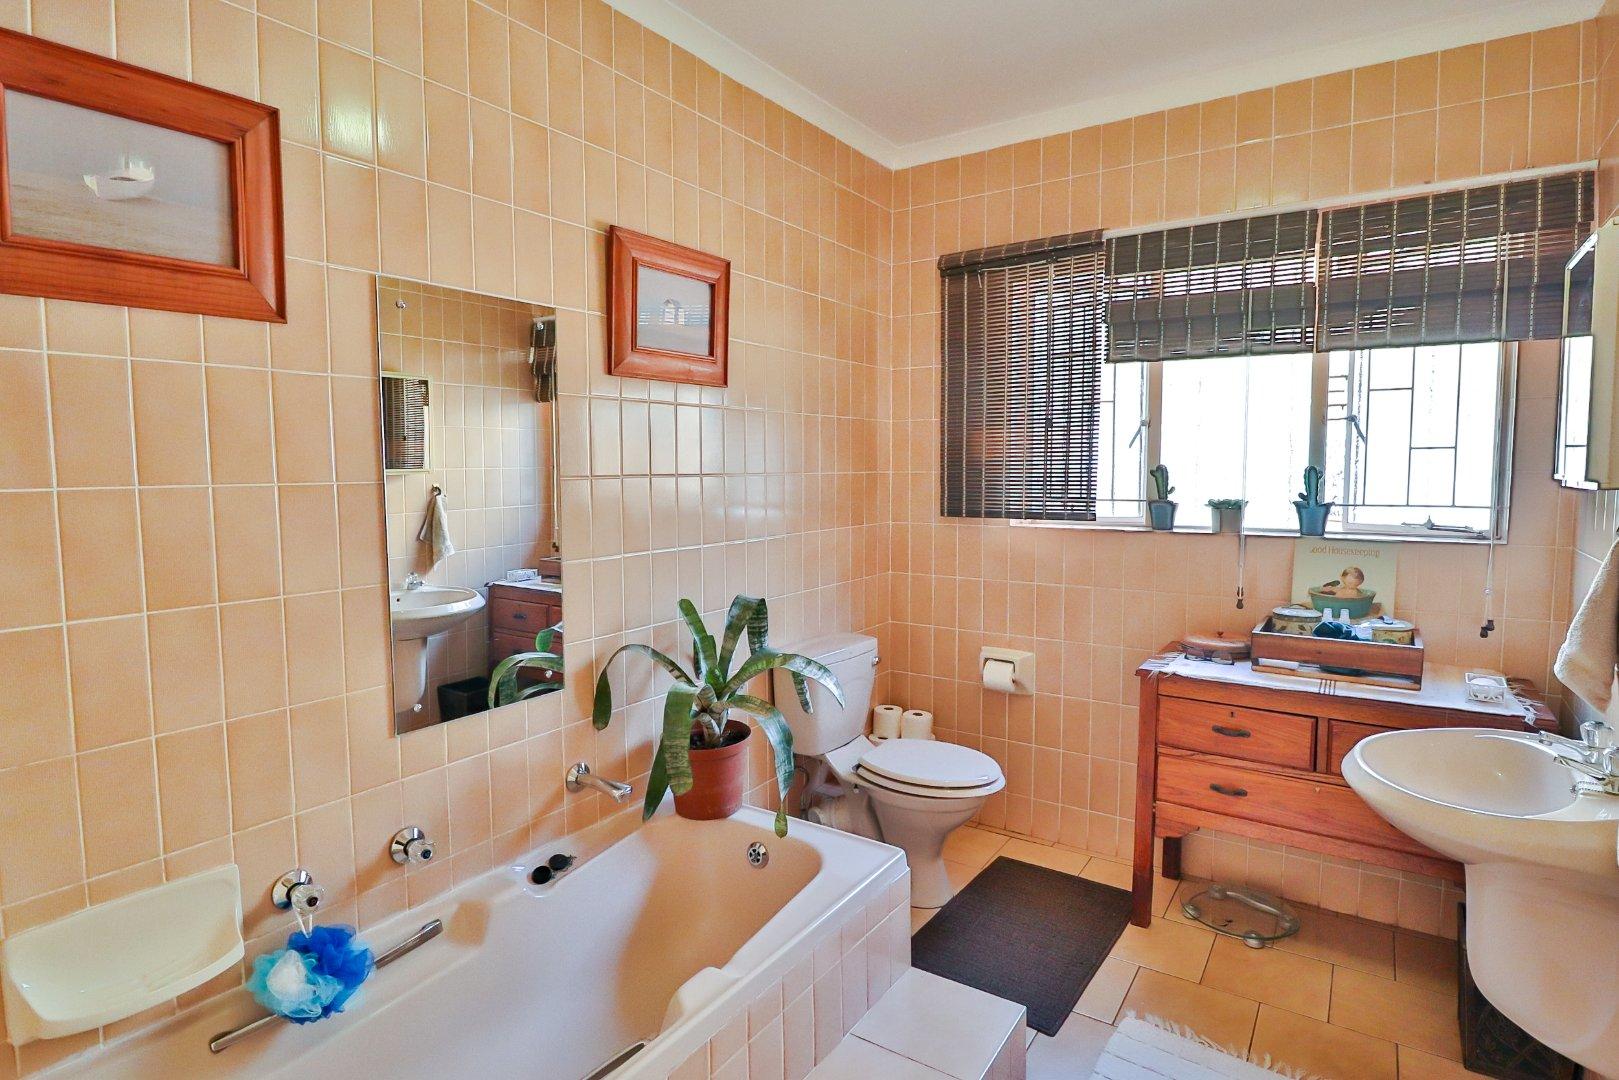 AIDA | 4 Bedroom House For Sale In Montana Park, Pretoria